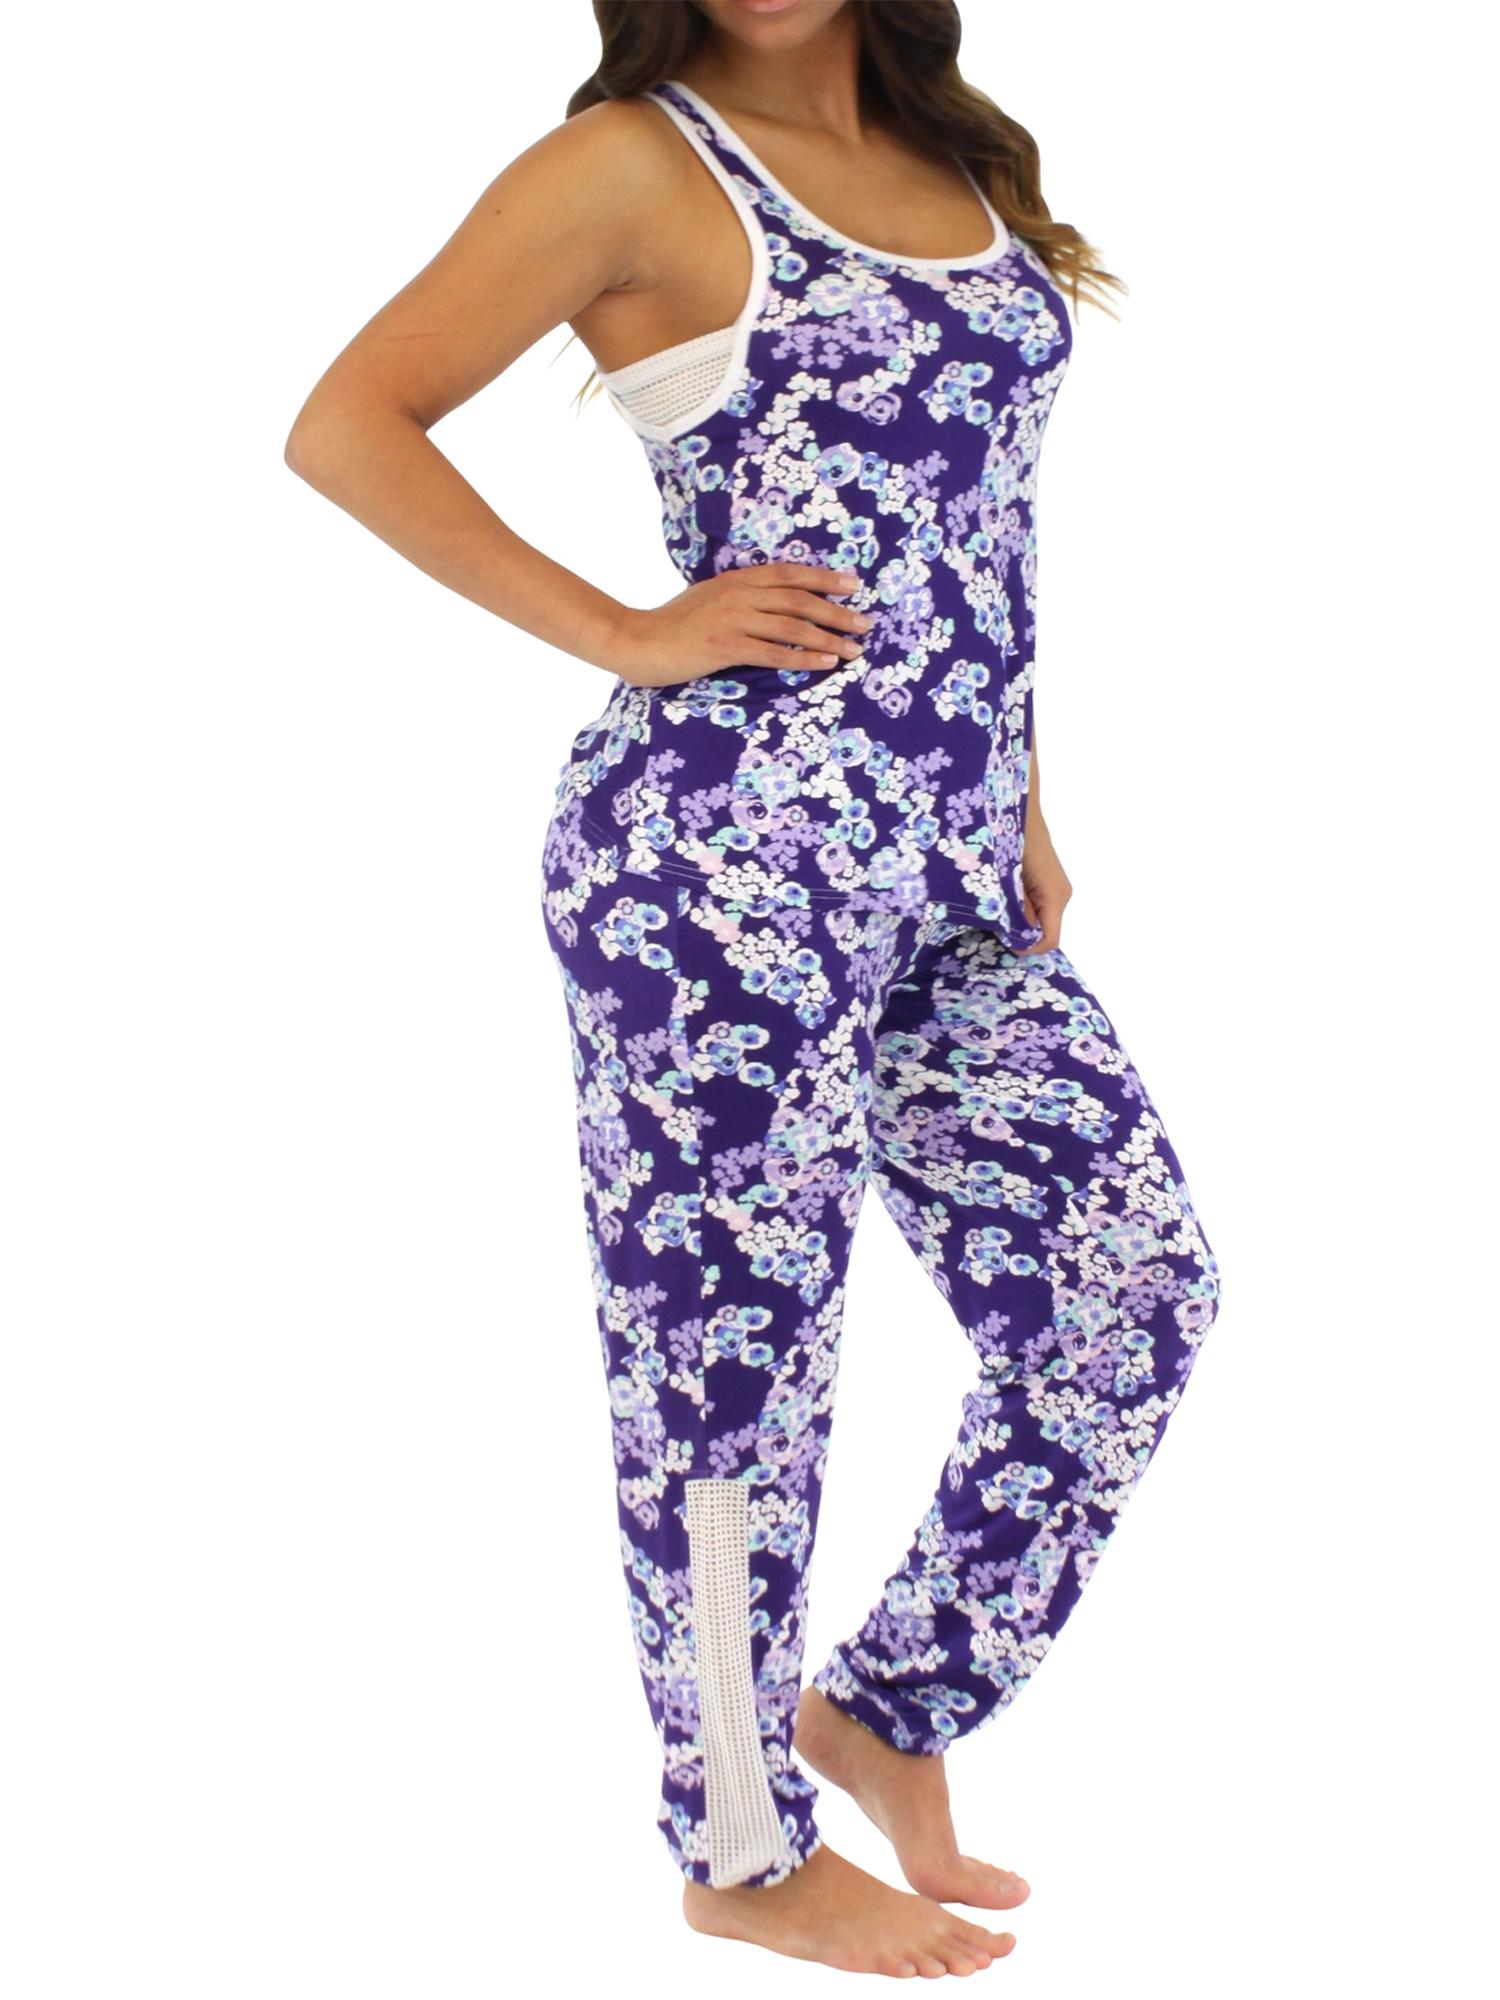 Pajama Heaven Women's Sleepwear Lightweight Tank and Pant Pajama Set with Mesh